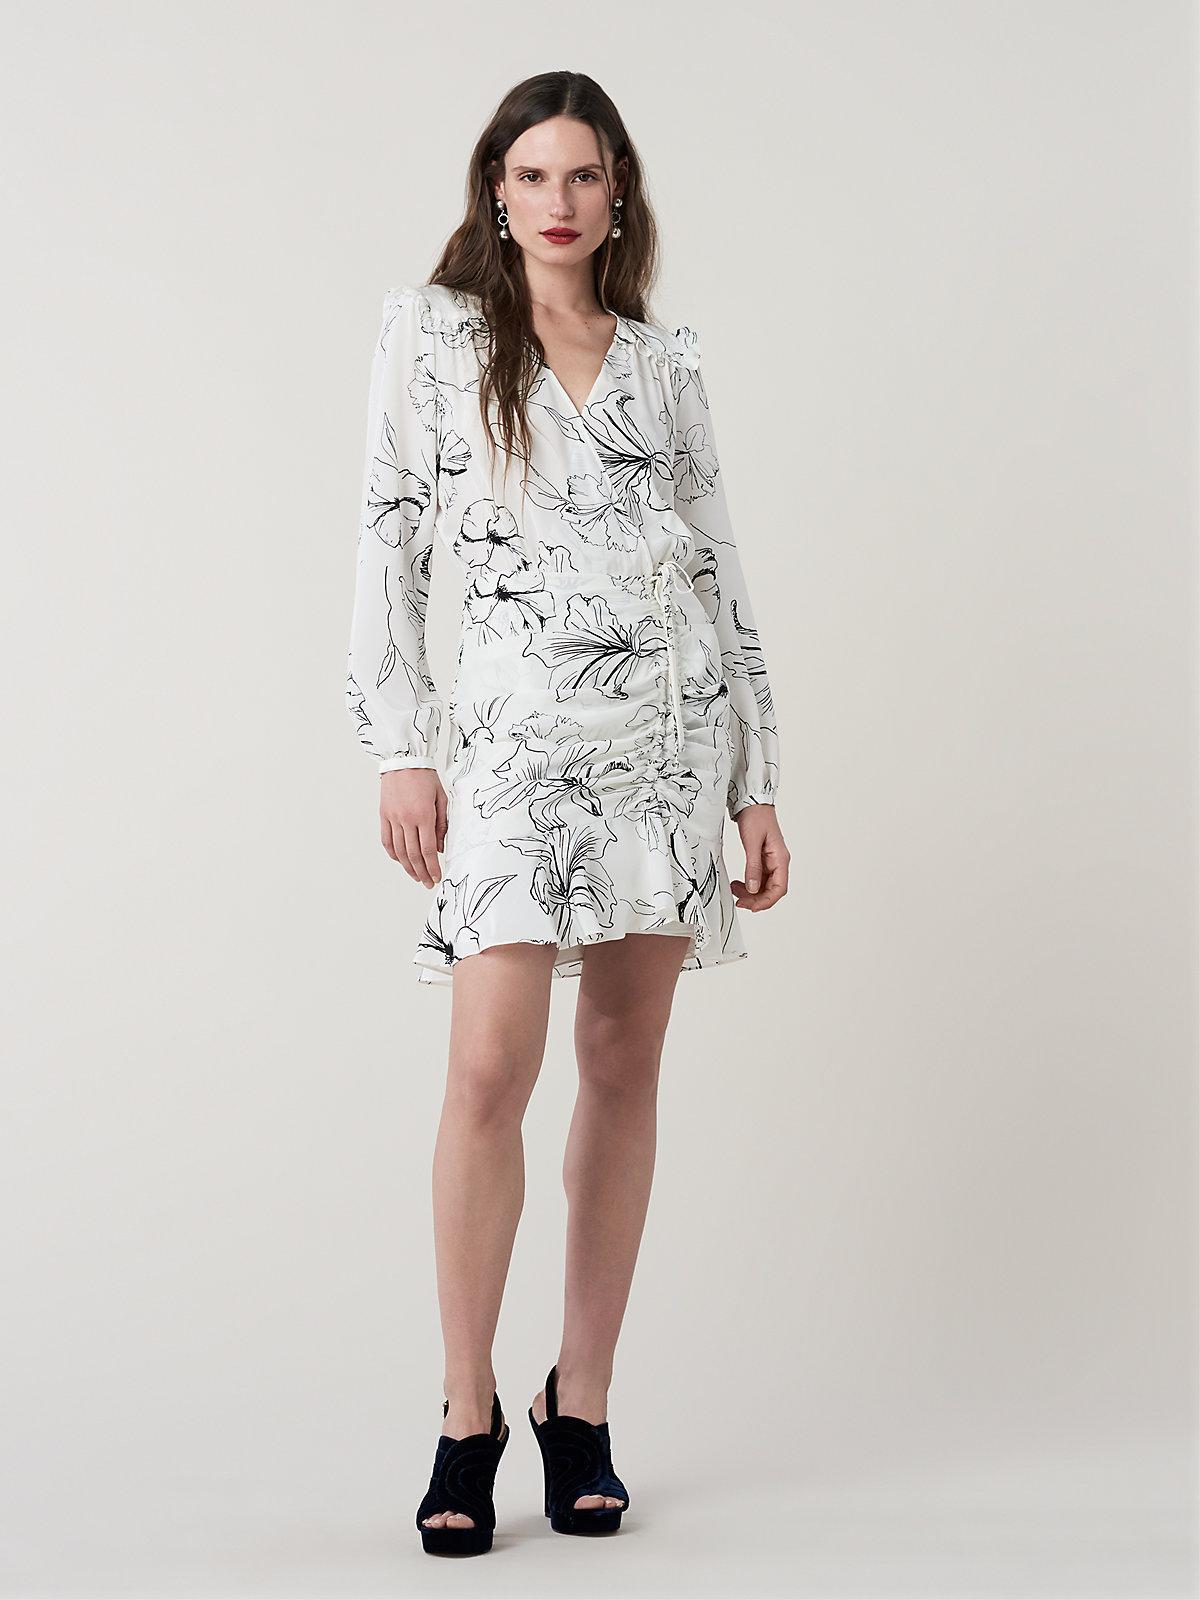 add7b04ae7a57 Lyst - Diane von Furstenberg Seline Ruffled Silk Mini Dress in White